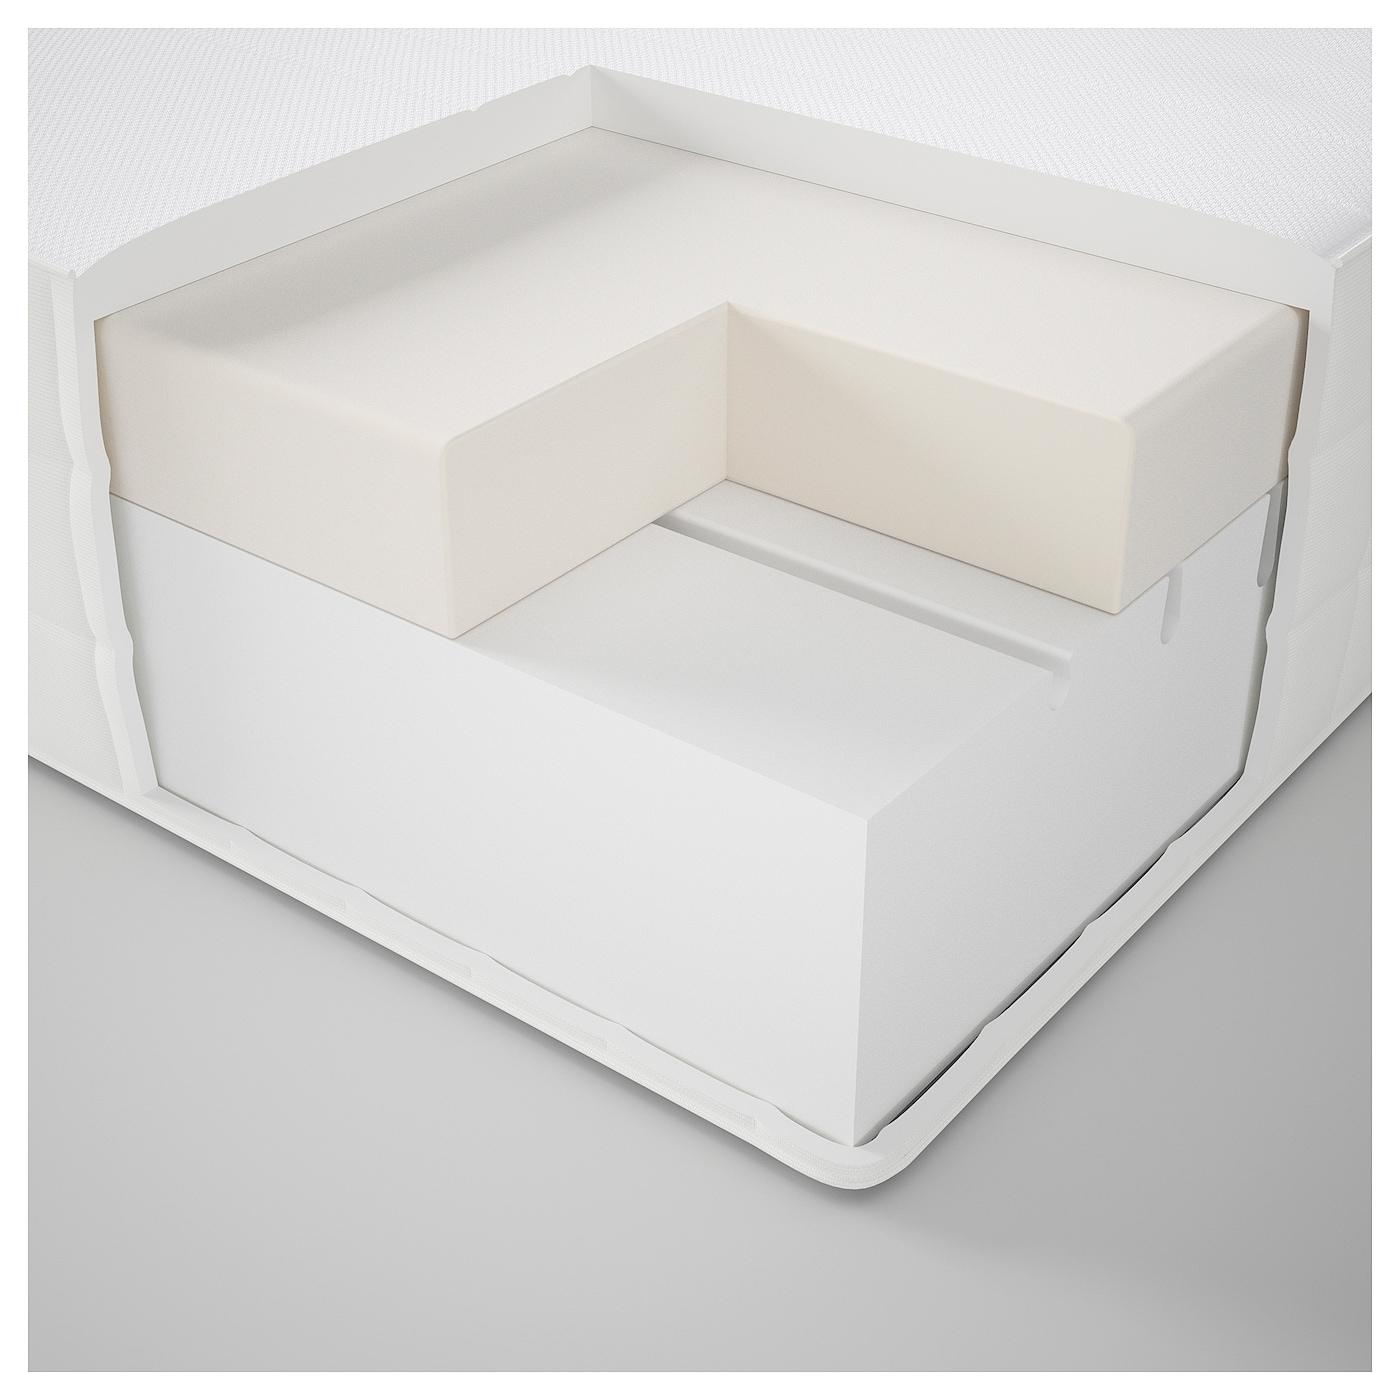 matrand colch n espuma viscoel stica firme blanco 90 x 190 cm ikea. Black Bedroom Furniture Sets. Home Design Ideas